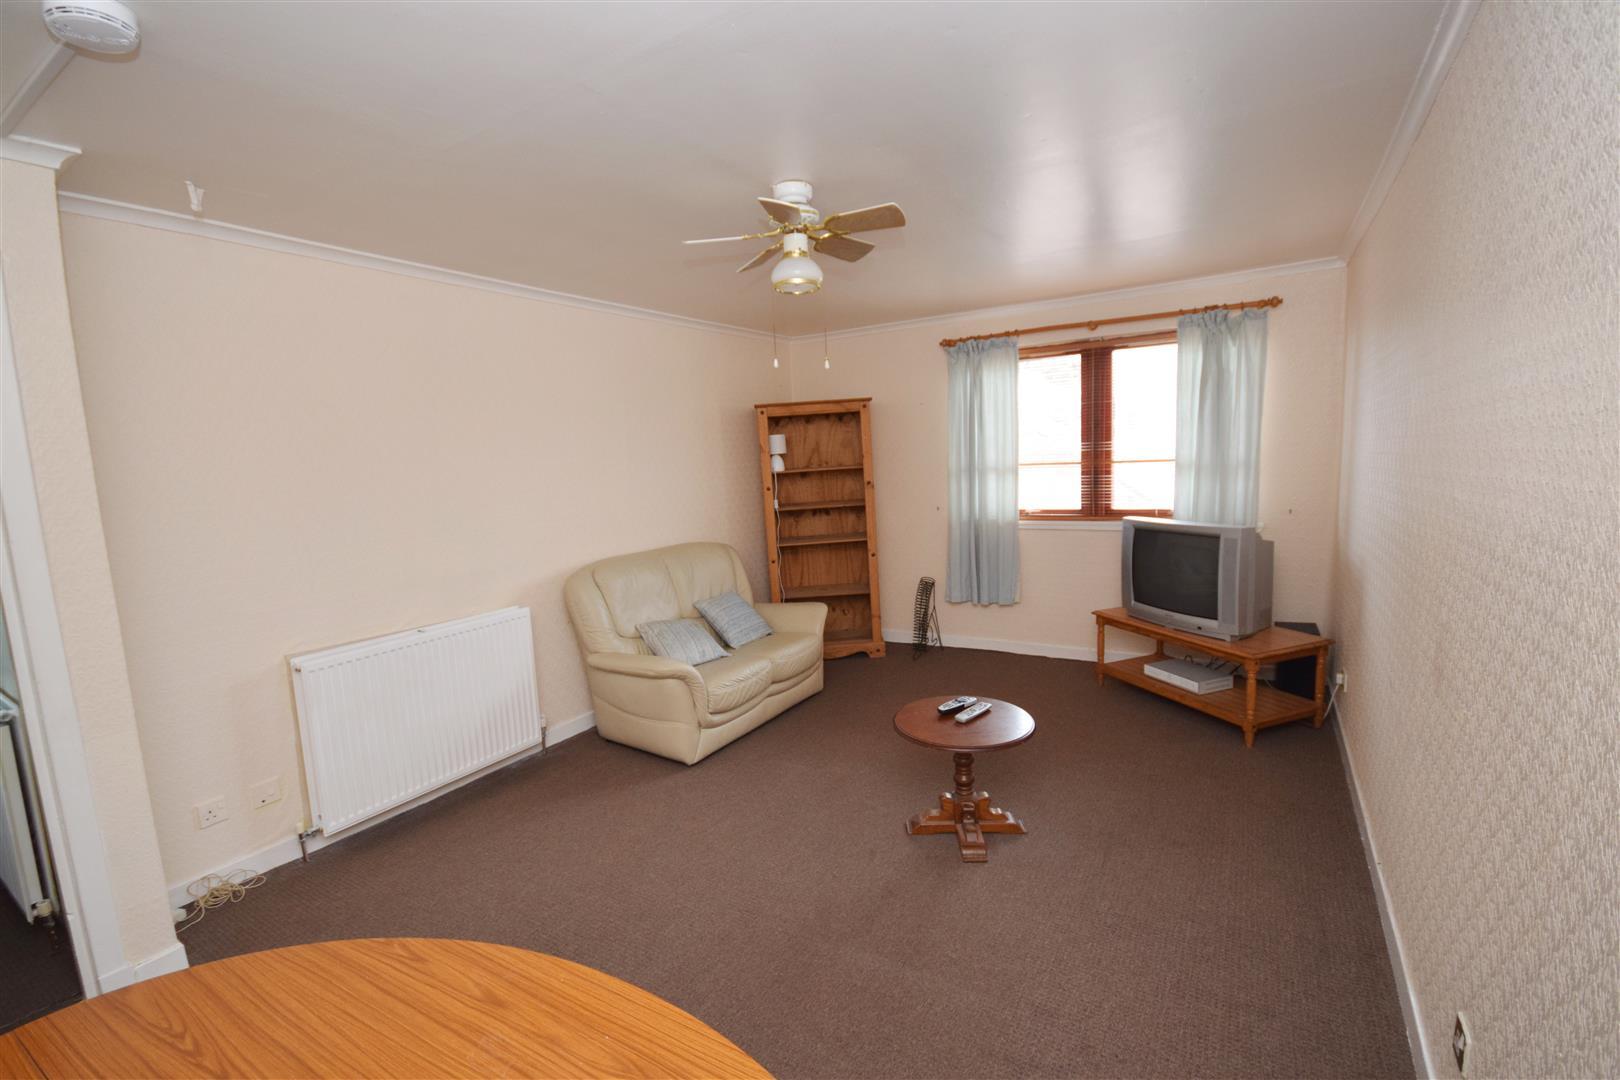 Flat E, 11, West High Street, Crieff, Perthshire, PH7 4AU, UK